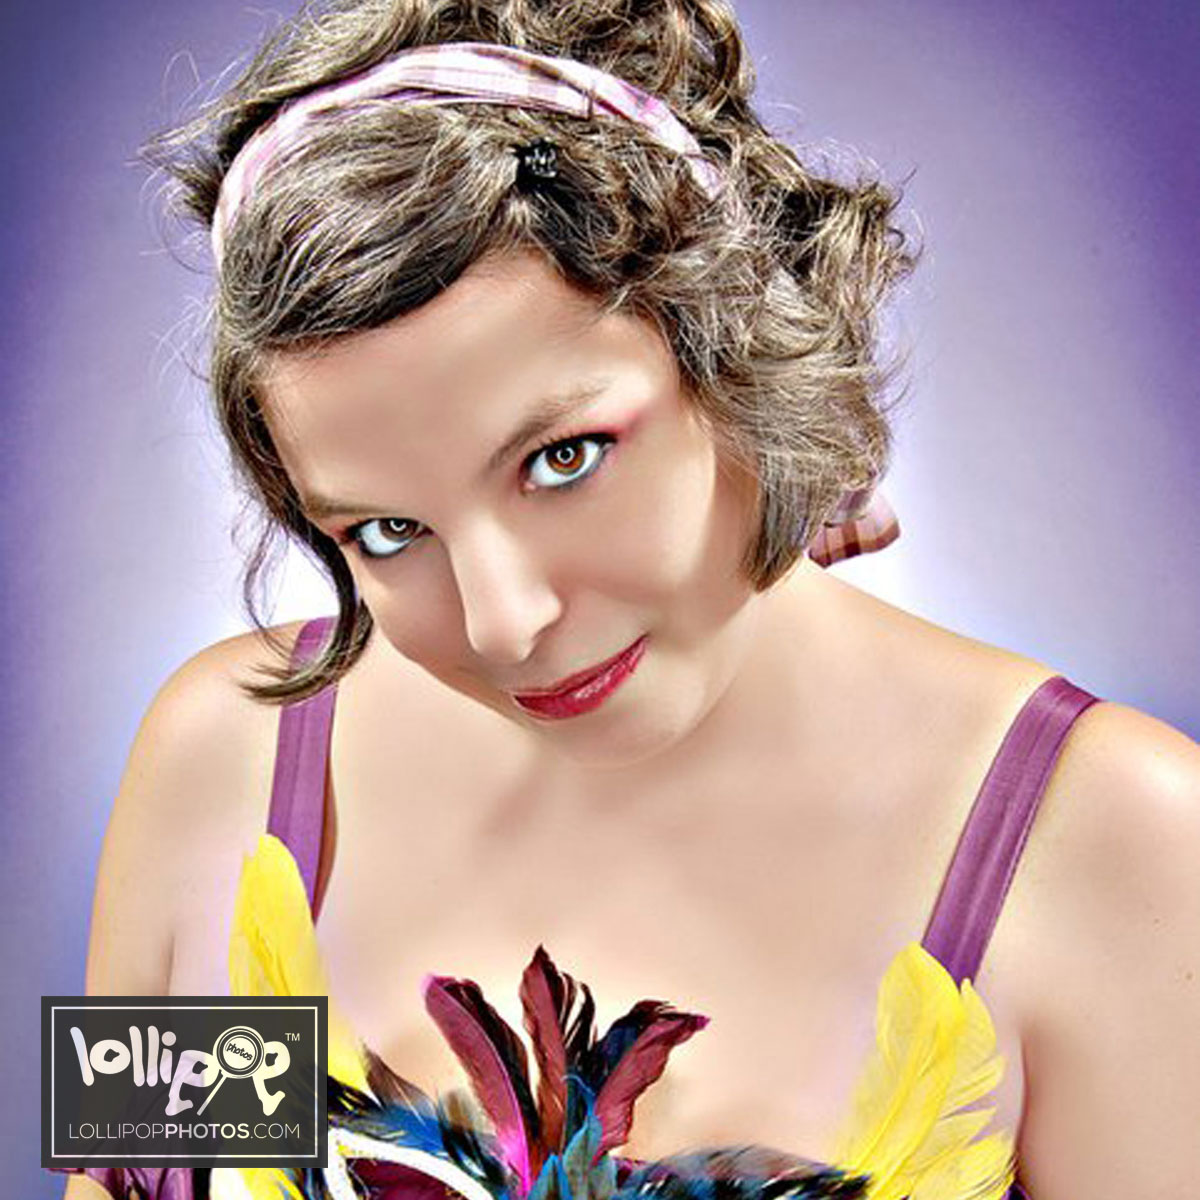 msdig-nora-canfield-lollipop-photos-522.jpg